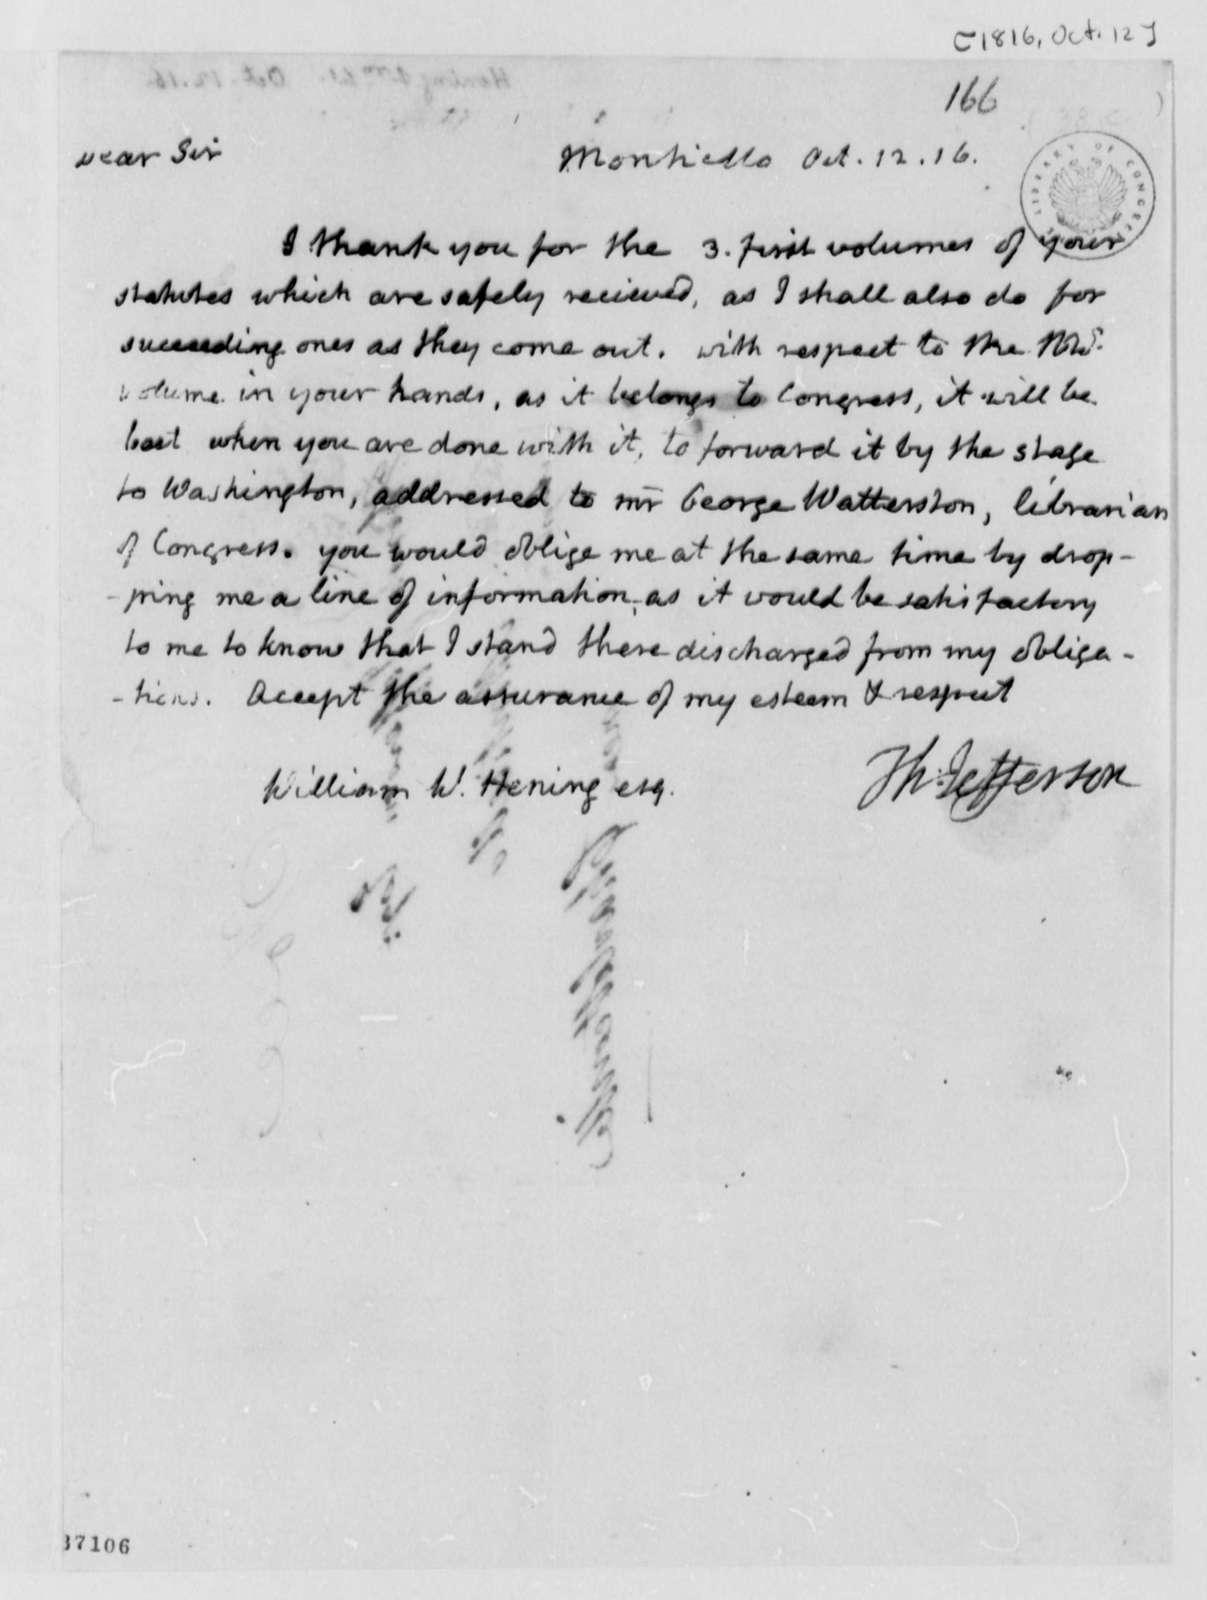 Thomas Jefferson to William Waller Hening, October 12, 1816